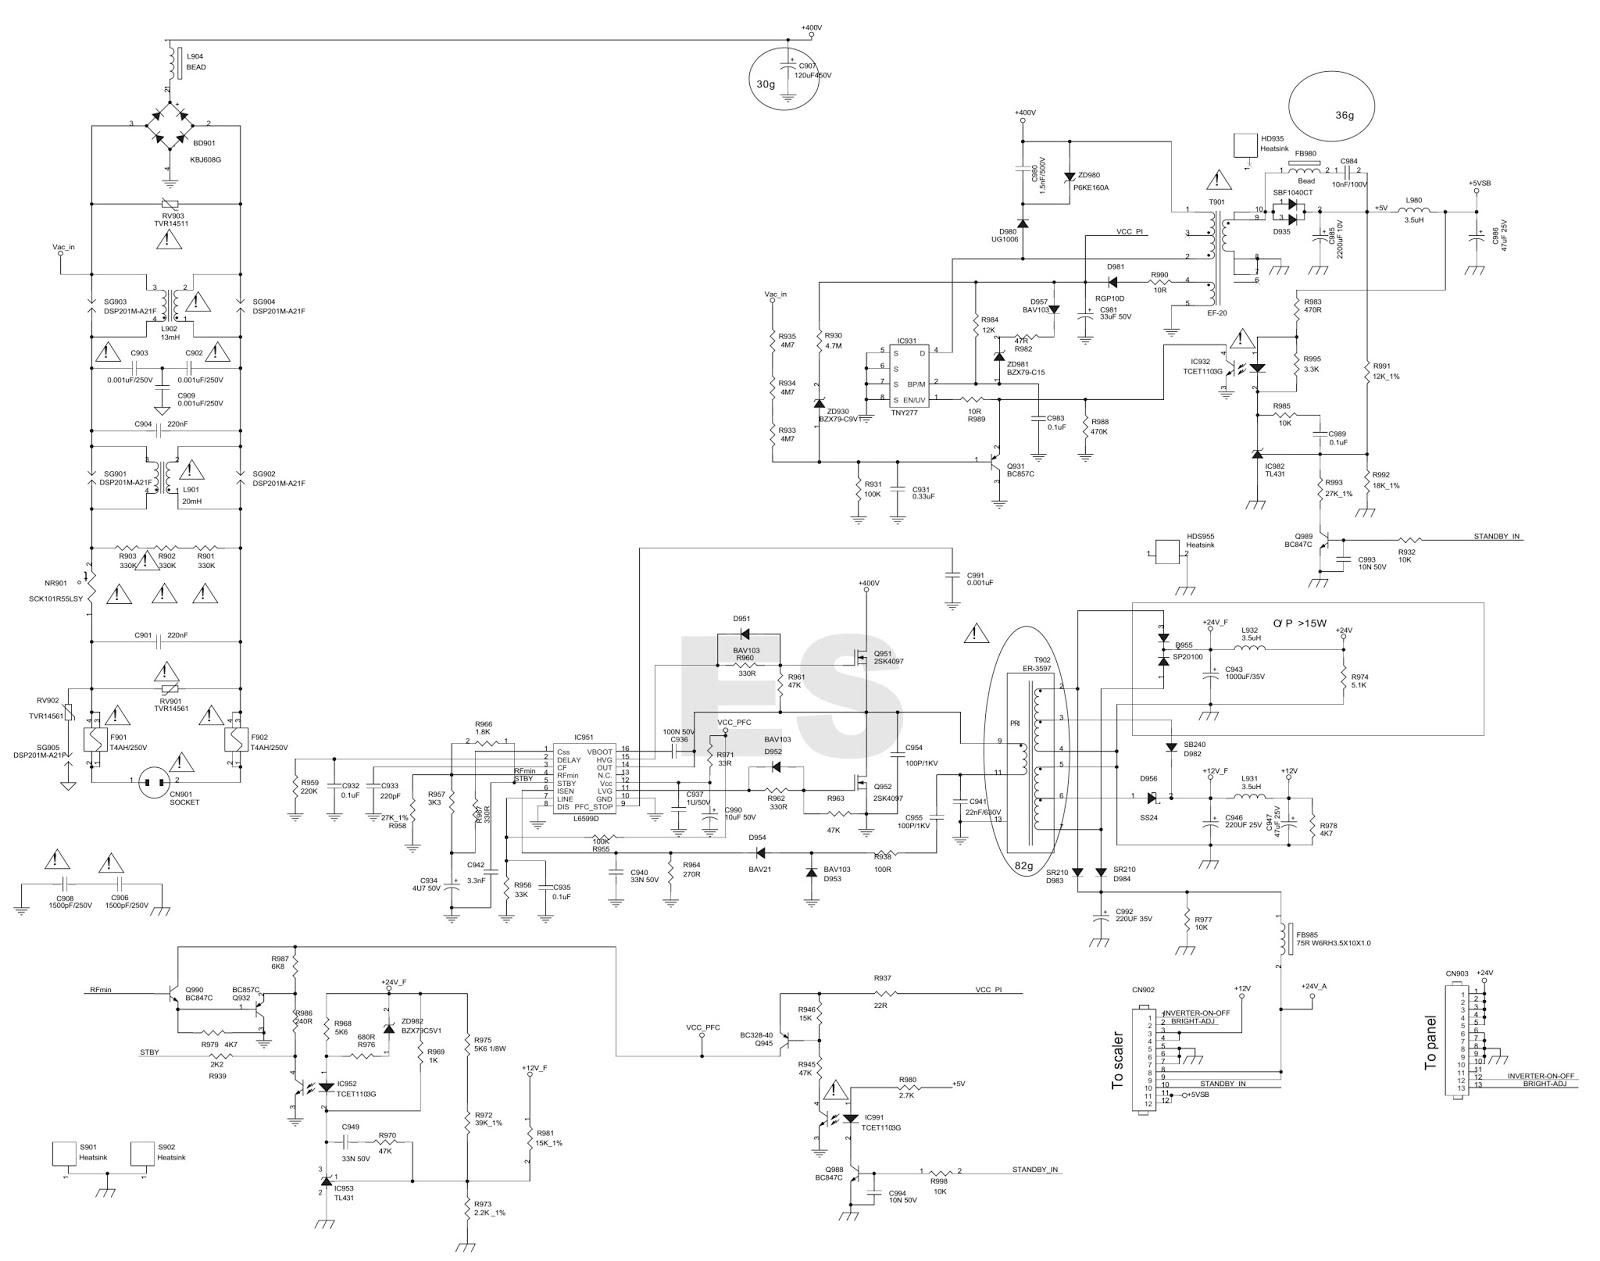 Philips Vs3 Wireless Lan Diagram